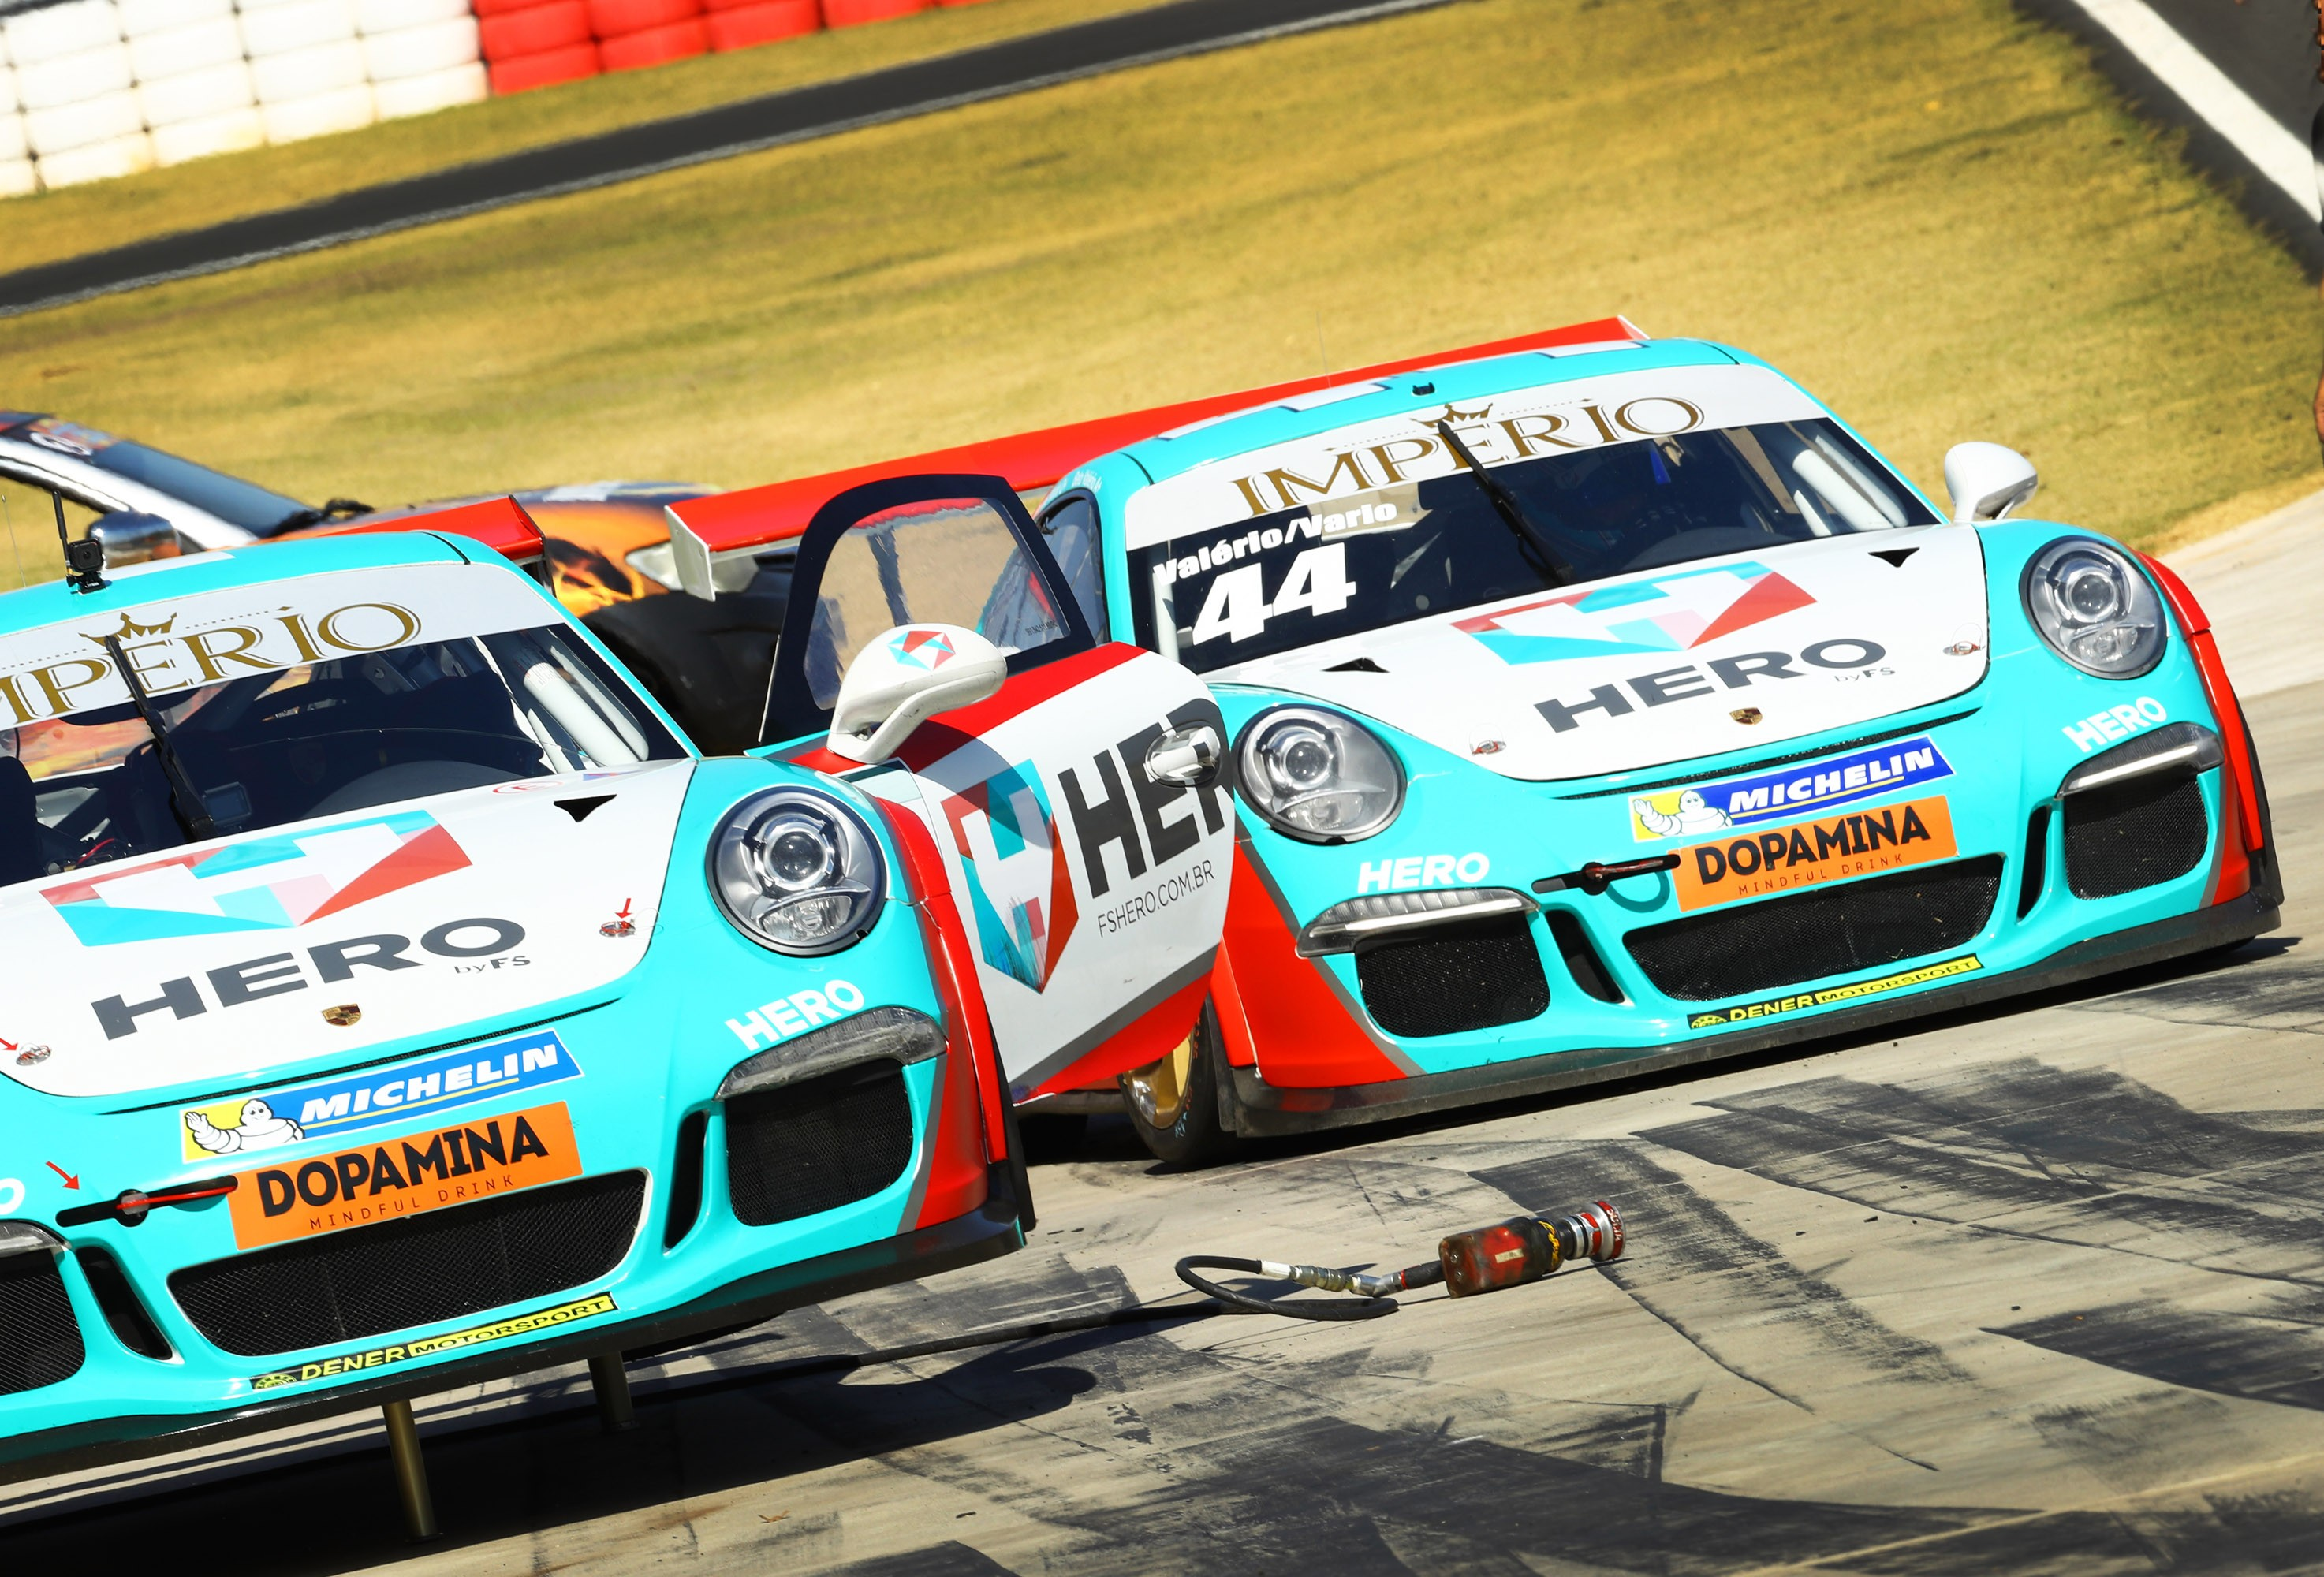 O Porsche #44 da dupla Beto Valério/Marcus Vario, fazendo sua parada nos boxes para troca de piloto e abastecimento (Foto: Porsche Império GT3 Cup/Luca Bassani)